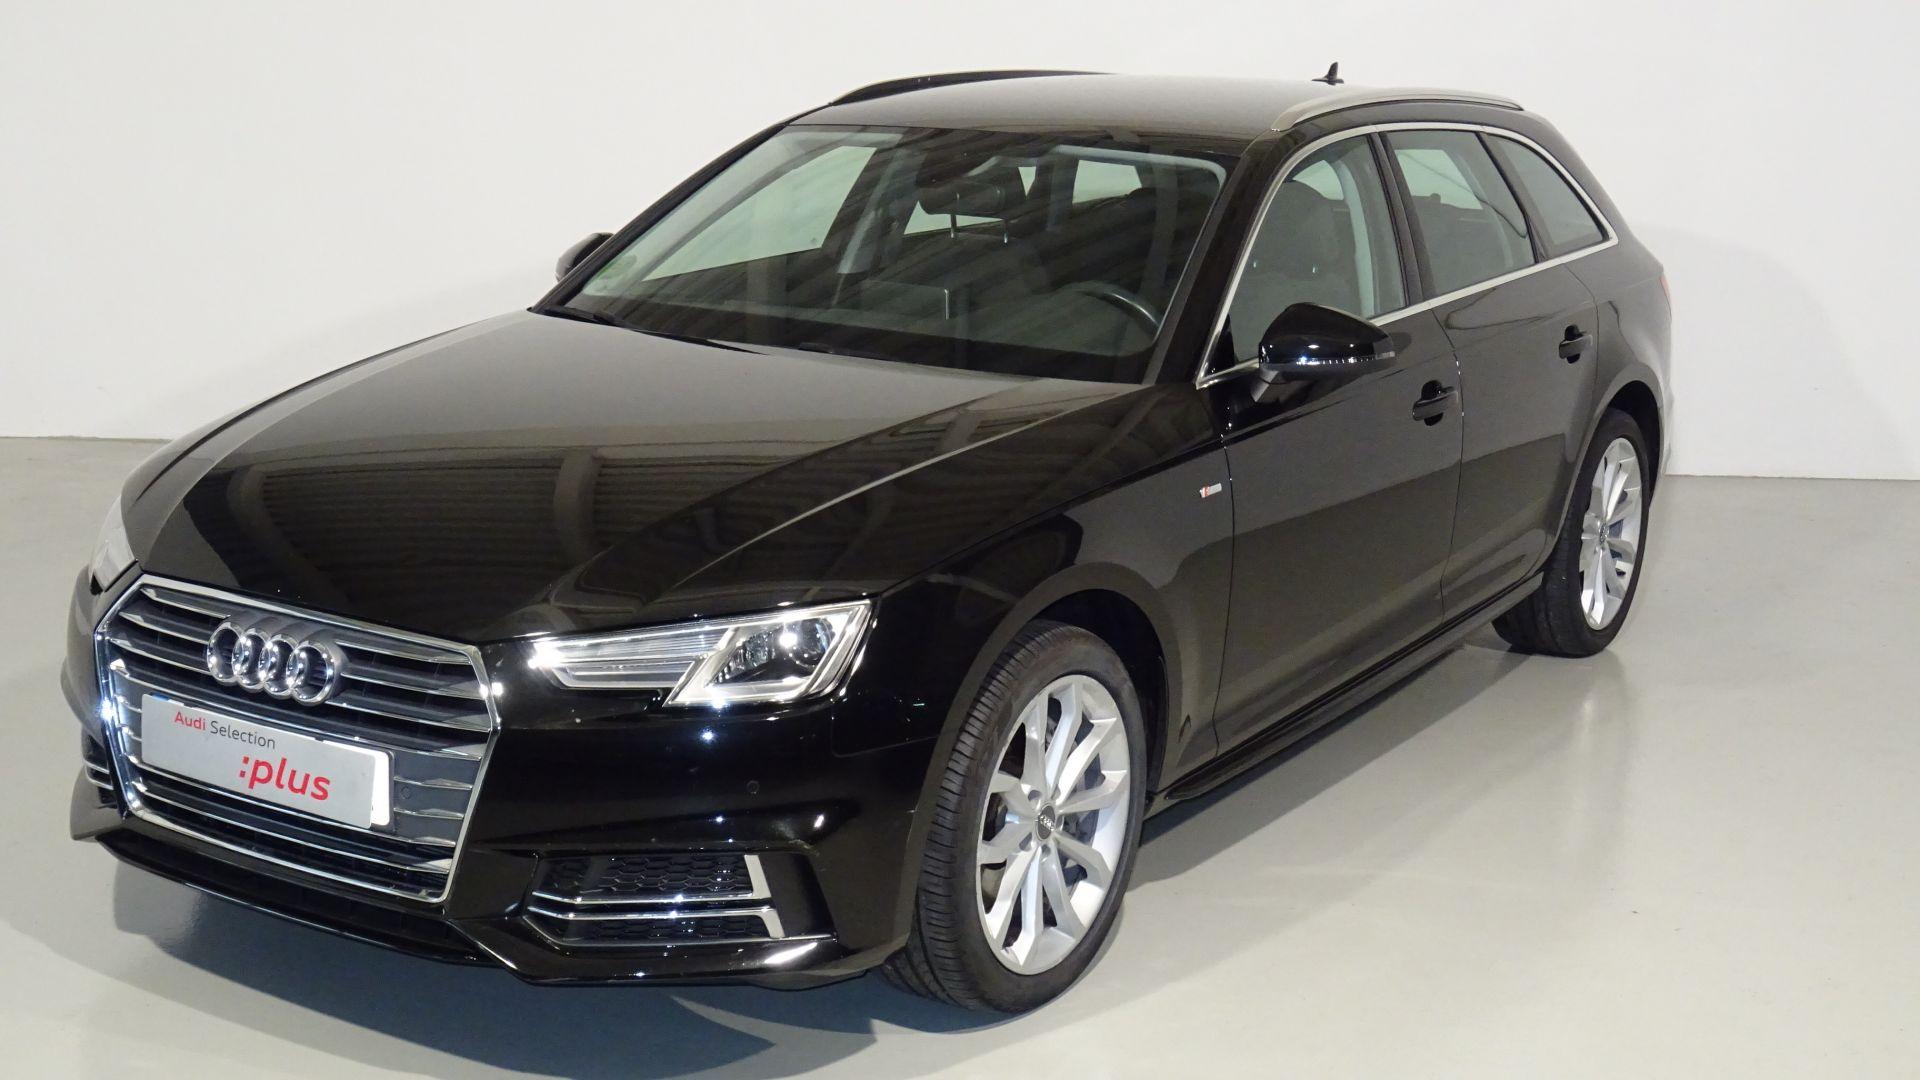 Audi A4 Avant 2.0 TDI 140kW(190CV) S line edit